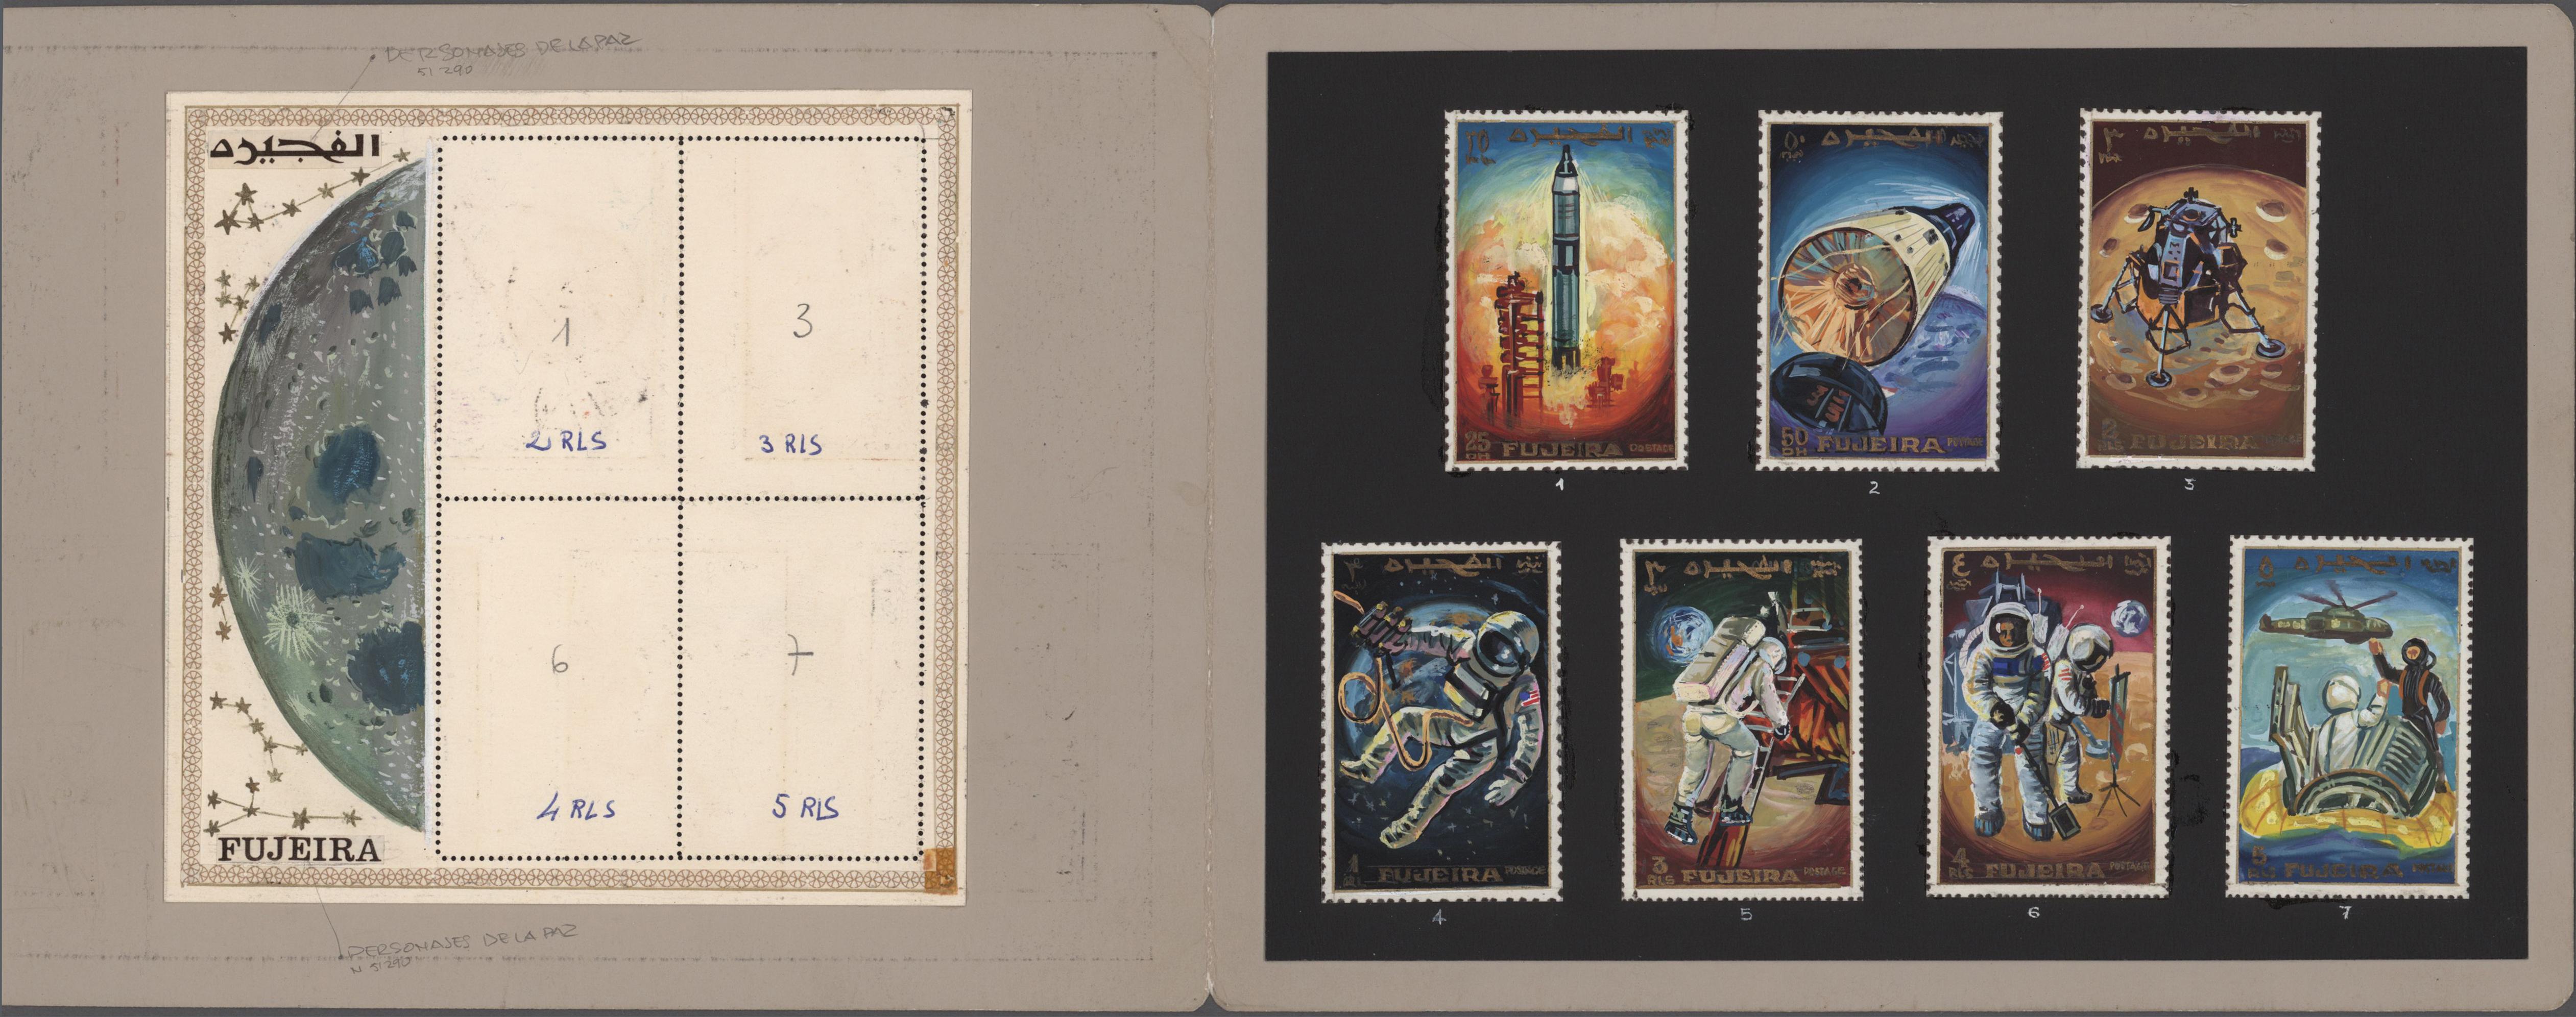 Lot 06487 - thematik: raumfahrt / astronautics  -  Auktionshaus Christoph Gärtner GmbH & Co. KG Sale #48 The Single Lots Philatelie